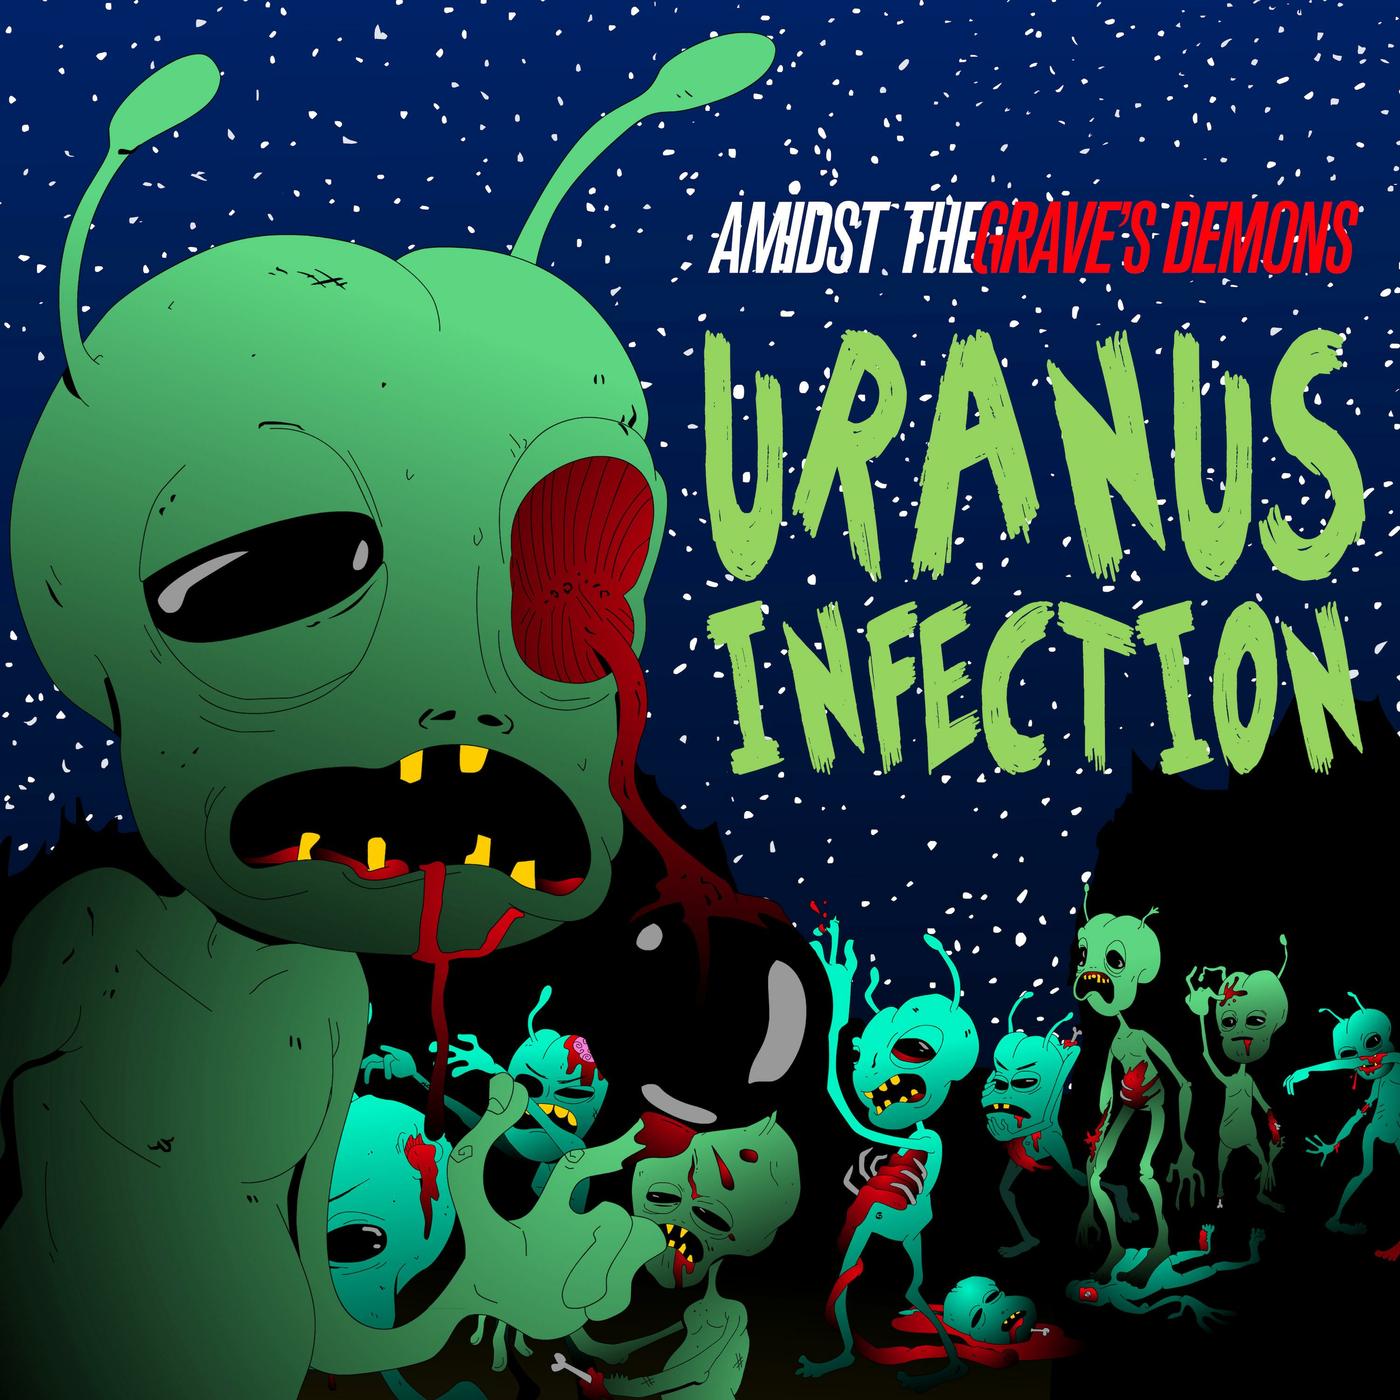 Amidst the Grave's Demons - Uranus Infection [single] (2016)